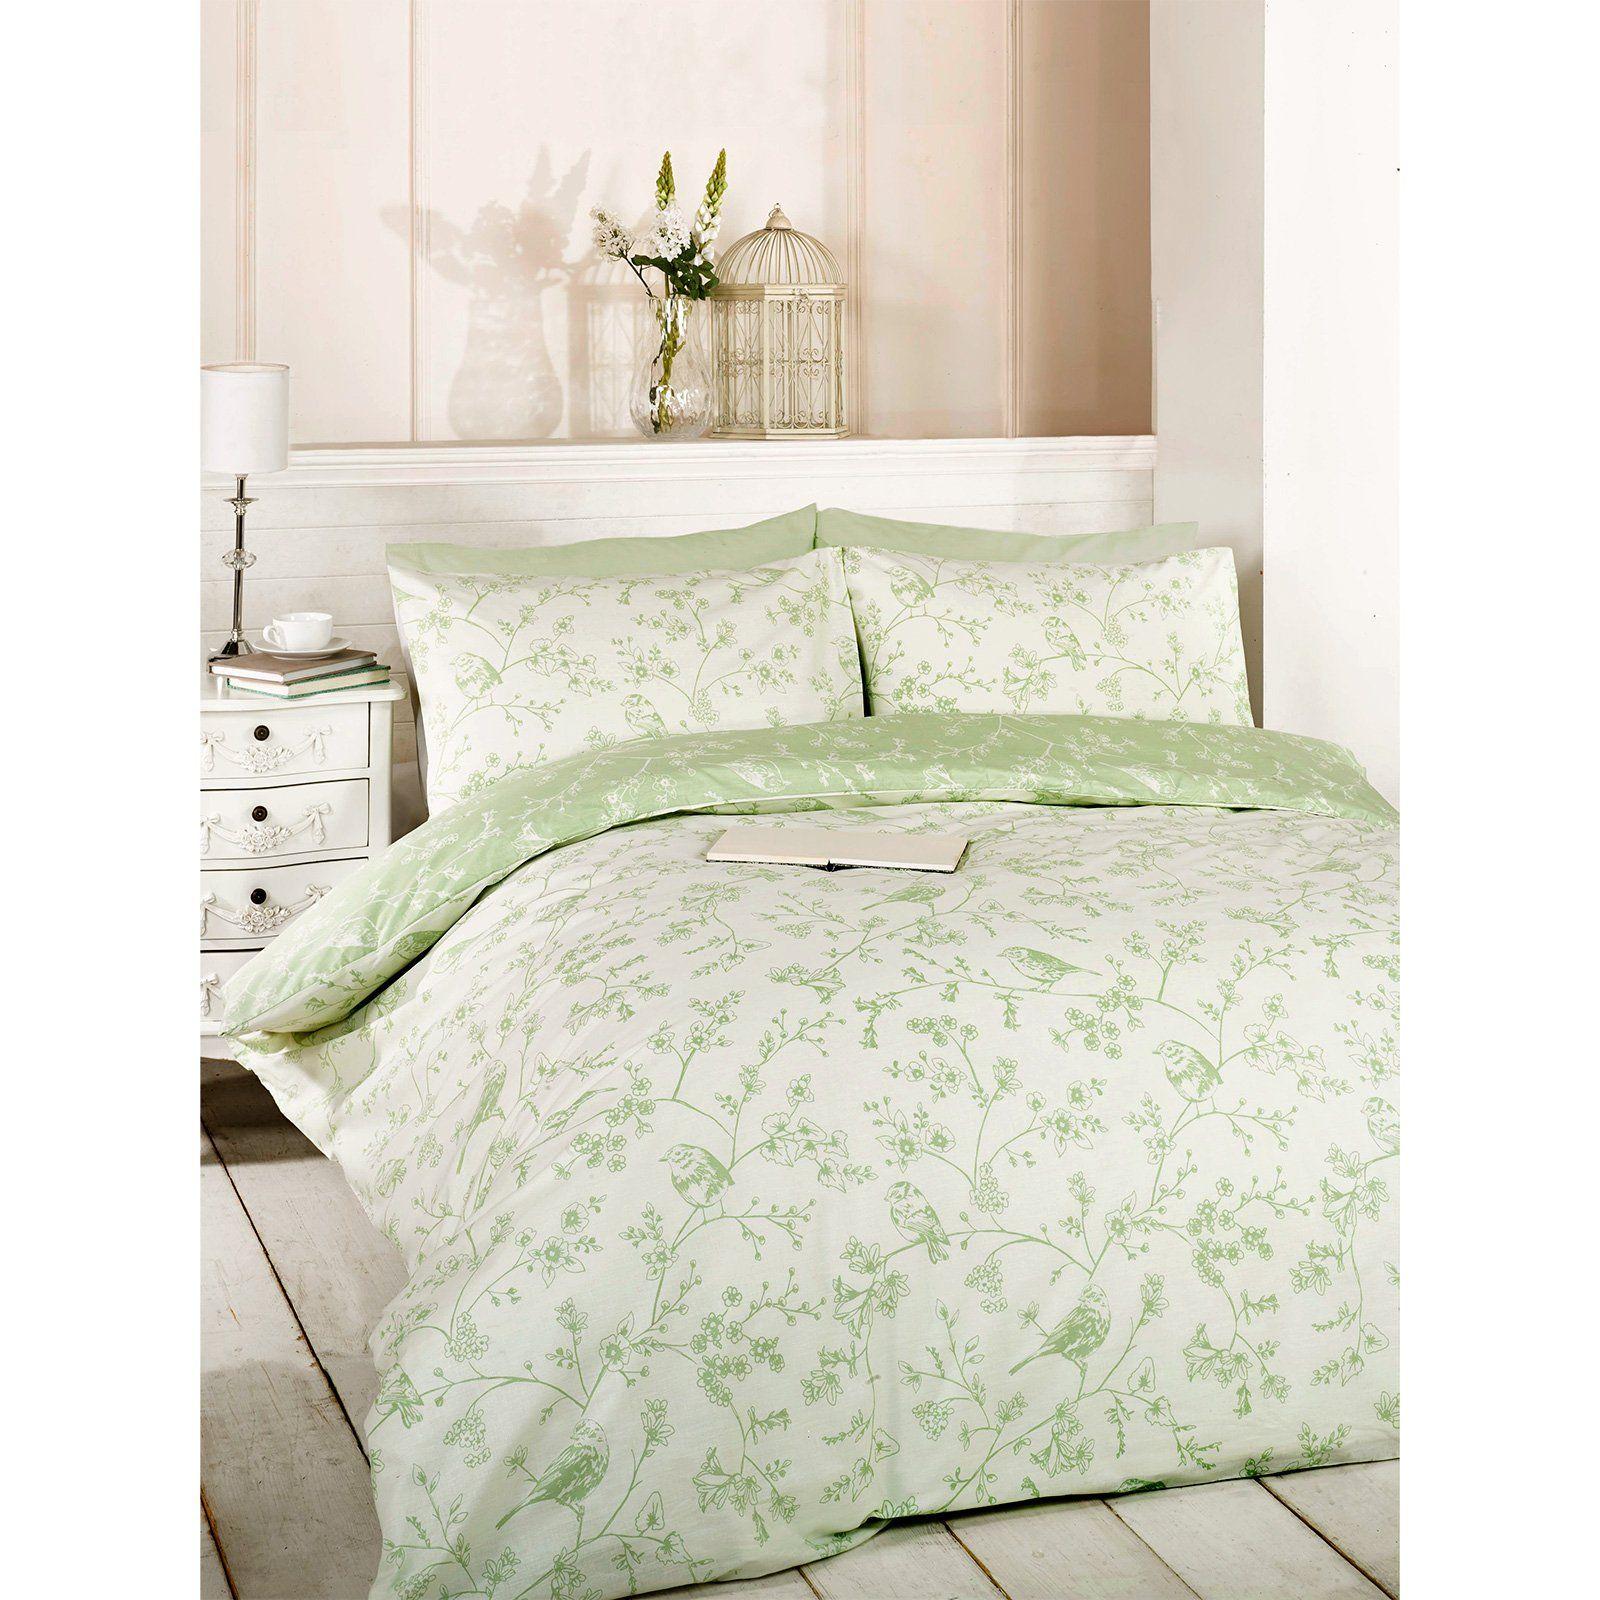 Blossom Fl Bird Duvet Cover Reversible Green Bedding Set With Pillow Case Double